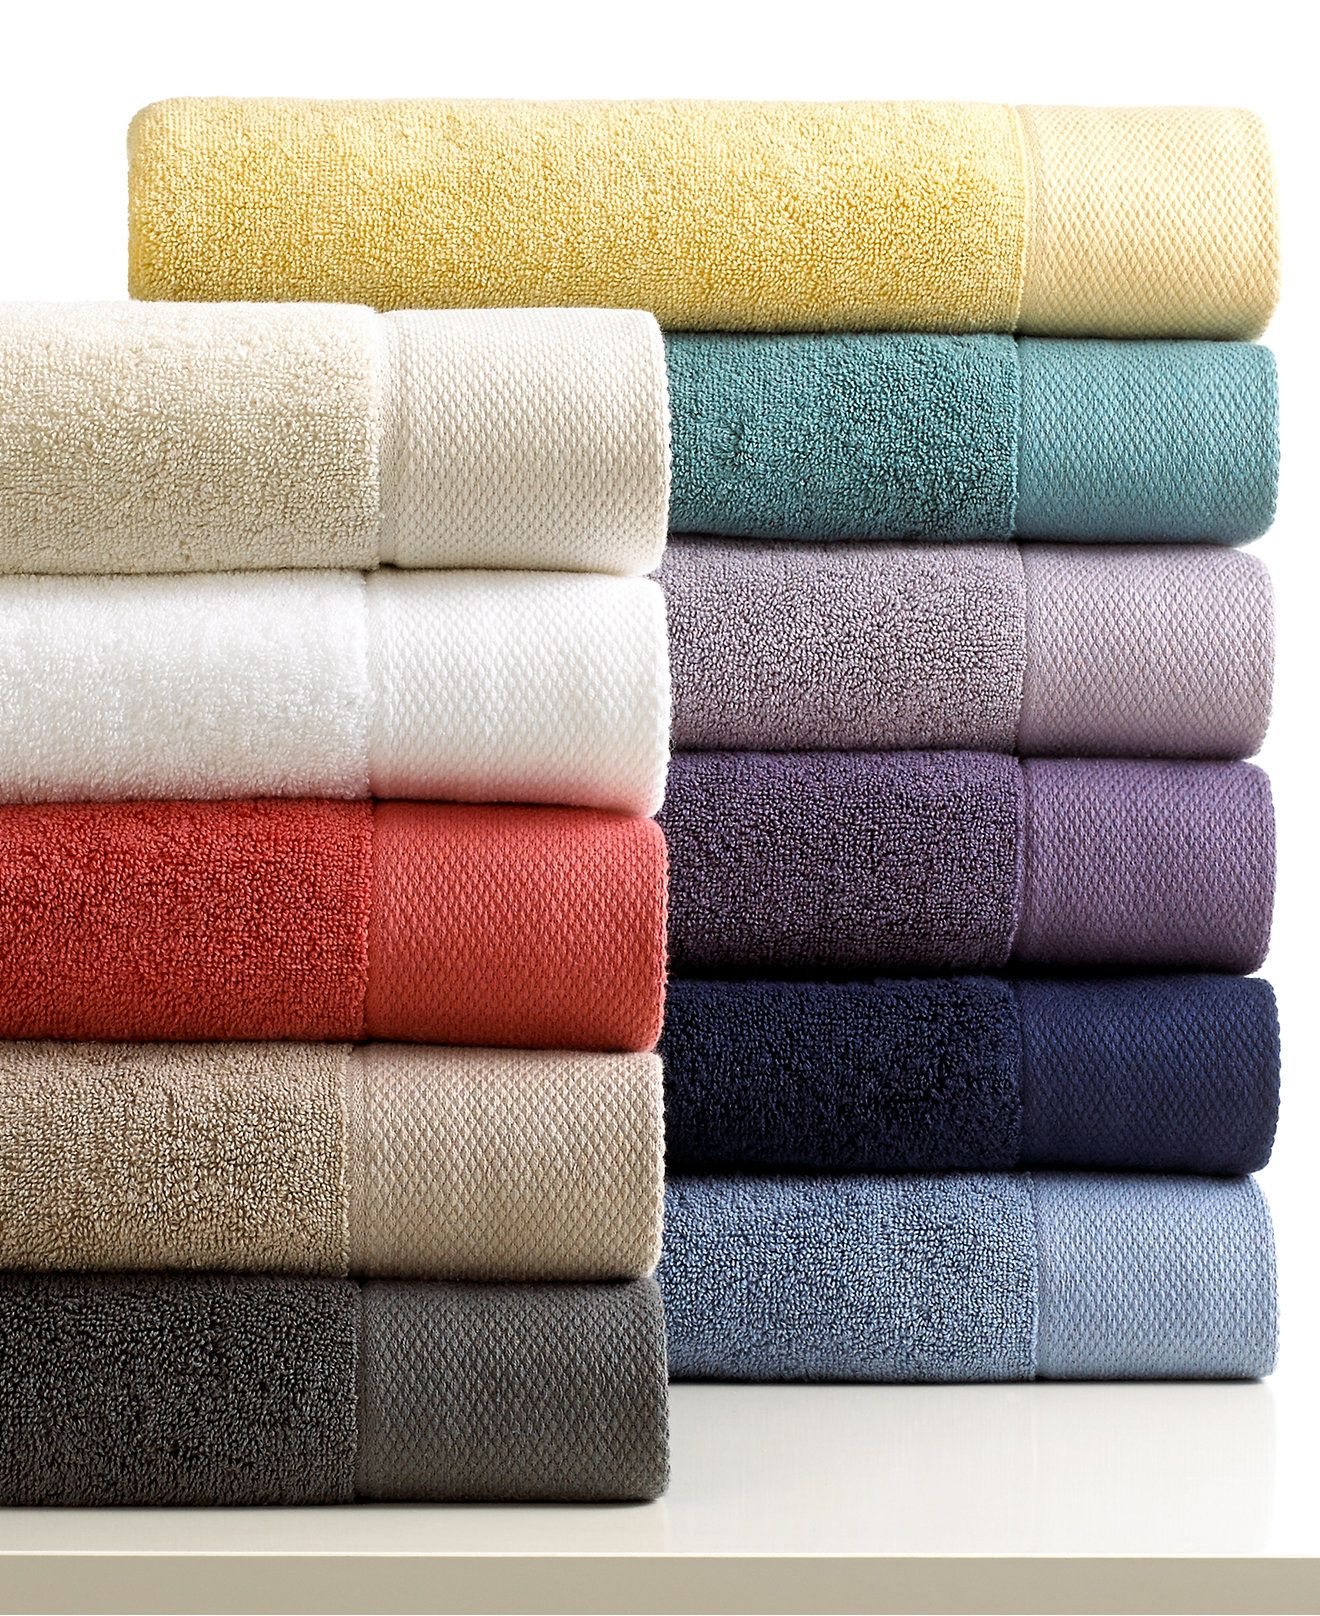 Hugo Boss Bath Towels Classiques Collection Bath Towels Bed Bath Macy S Tub Mat Bathroom Towels Colors Bathtub Makeover